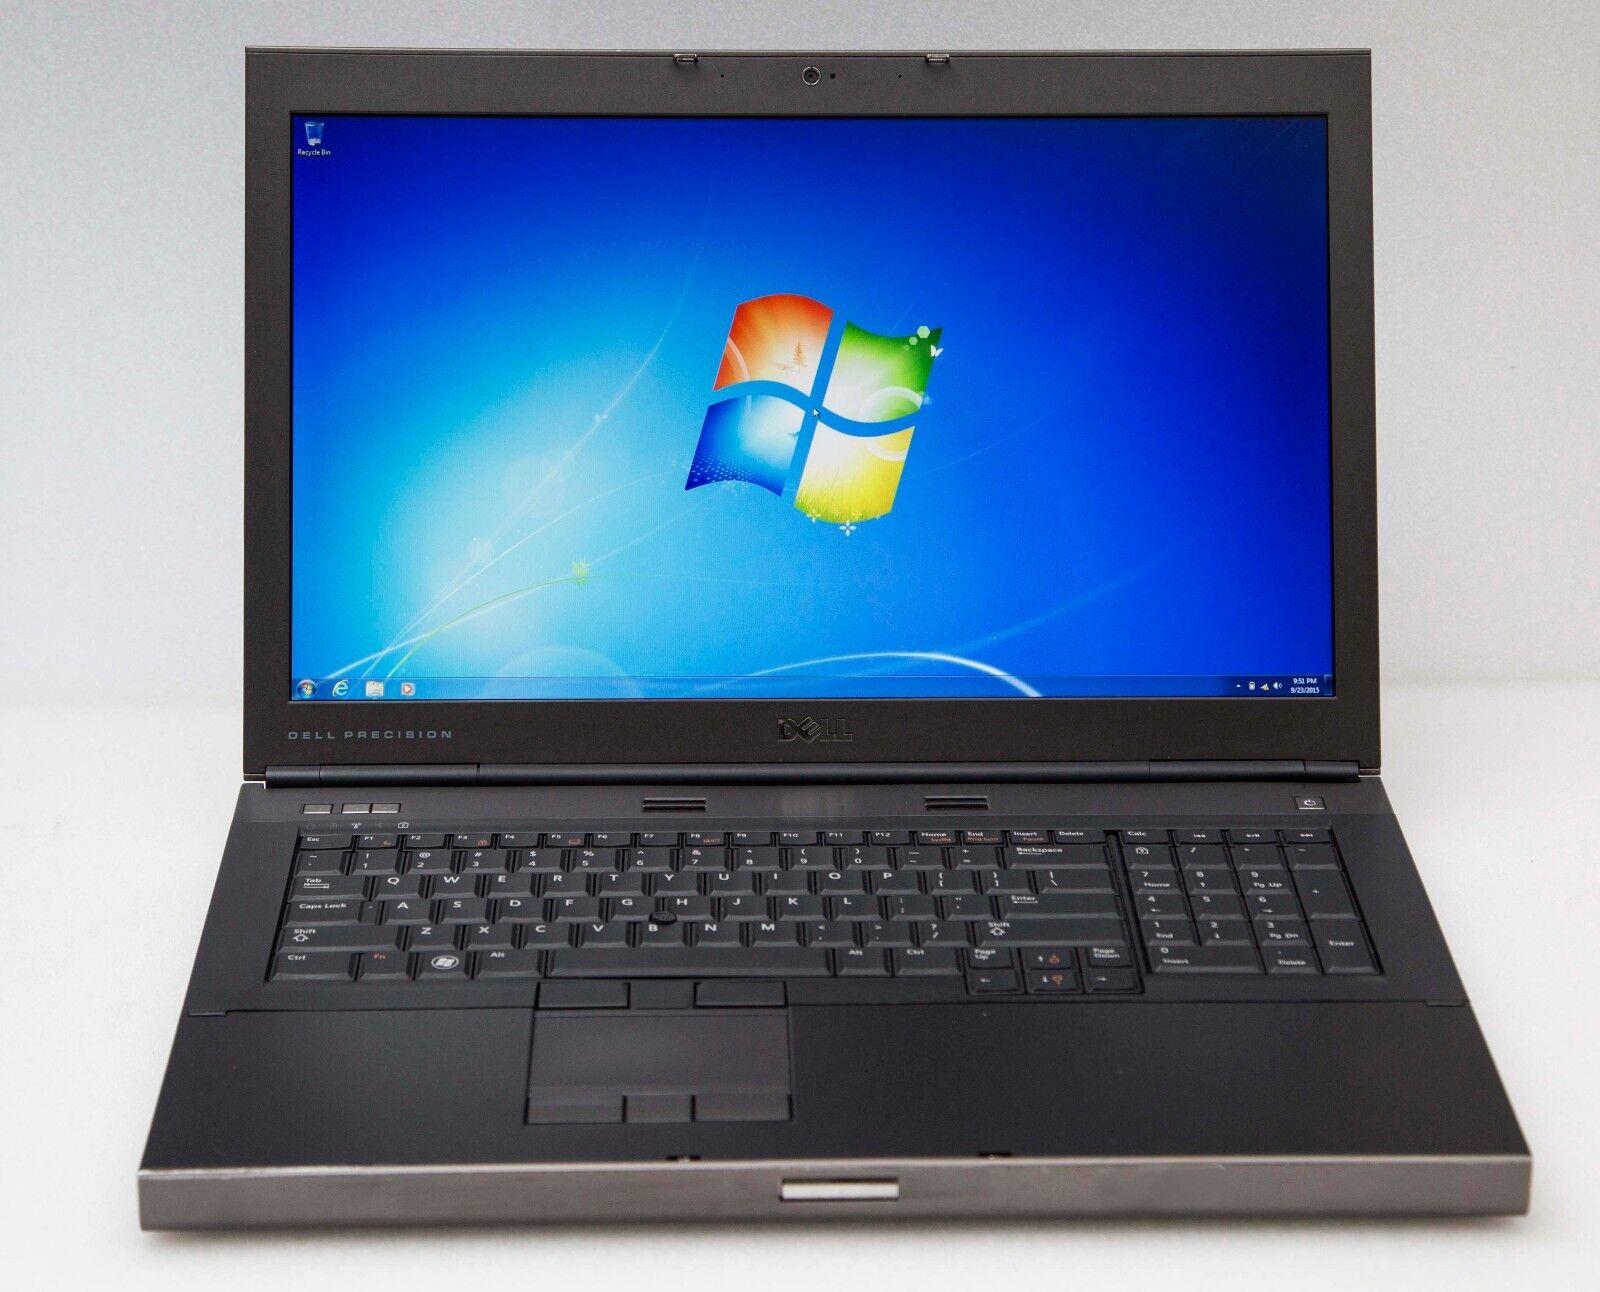 "Dell Precision M6600 17"" i7 2720QM 2.2GHz 32GB 256GB SSD NVd 3000m Gaming Laptop"